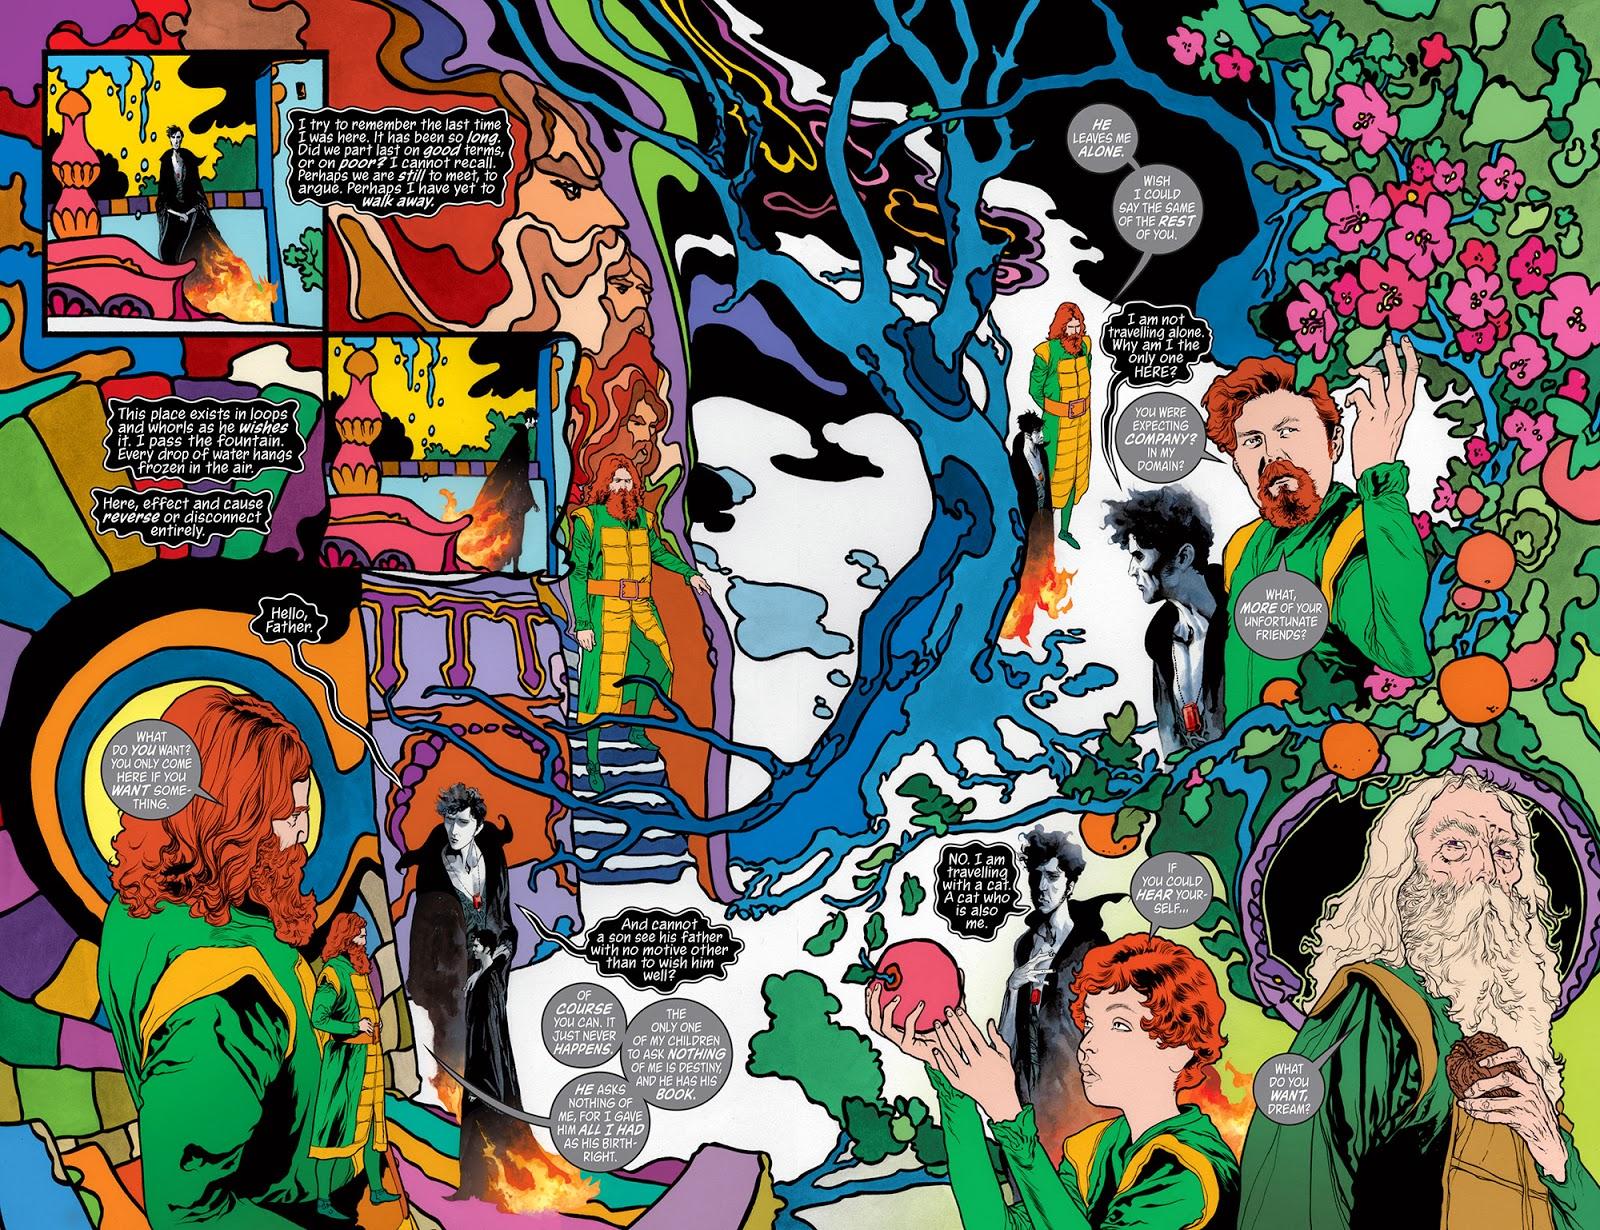 The Sandman: Overture by Neil Gaiman and JH Williams III (DC/Vertigo Comics)